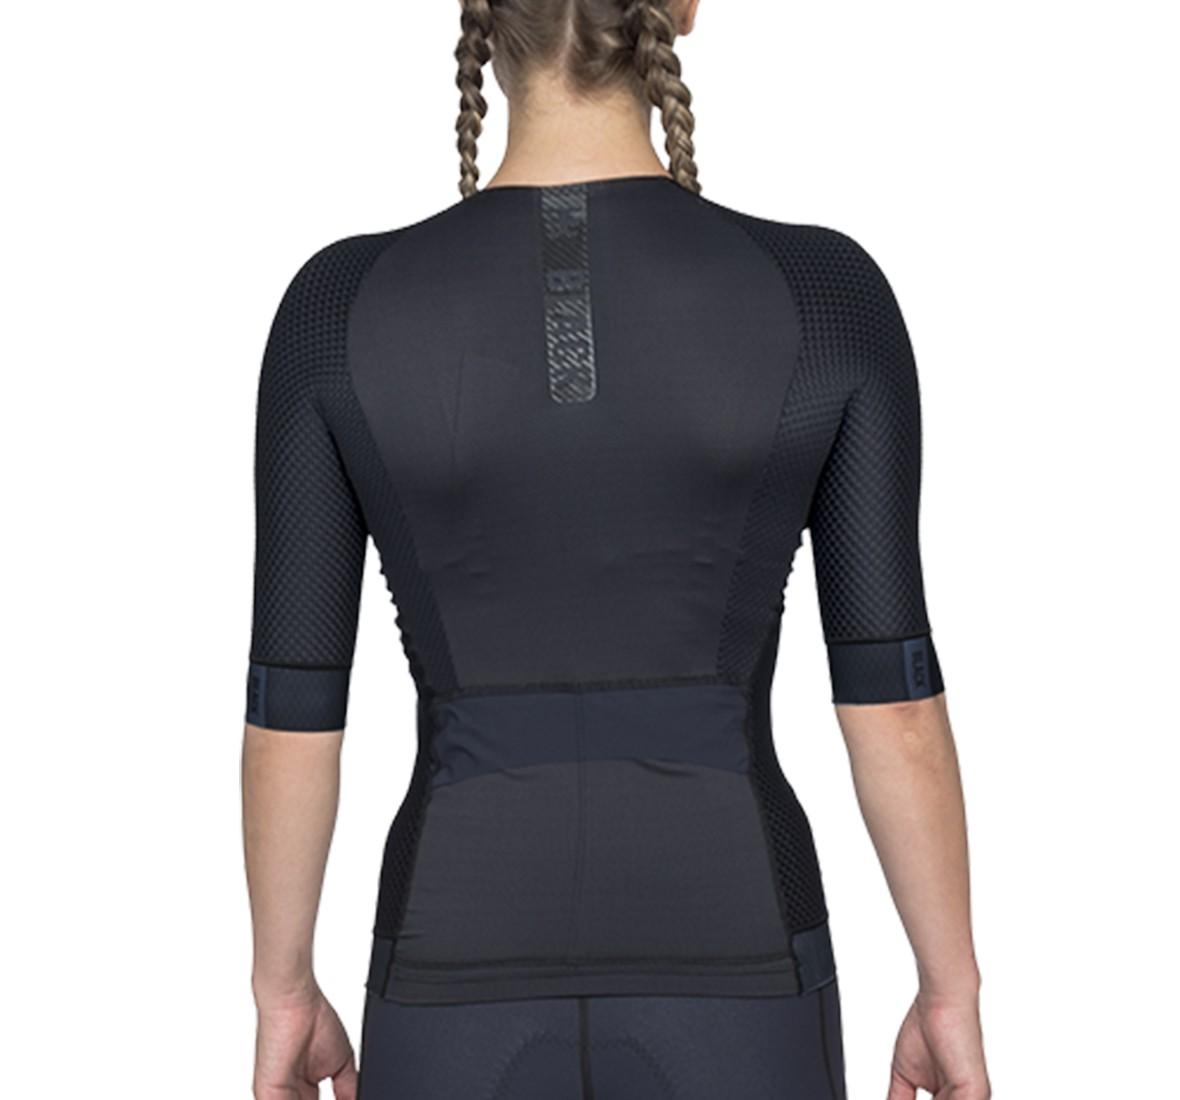 Top Triathlon c/ manga Carbon Black (Preto) - Fem - 2020